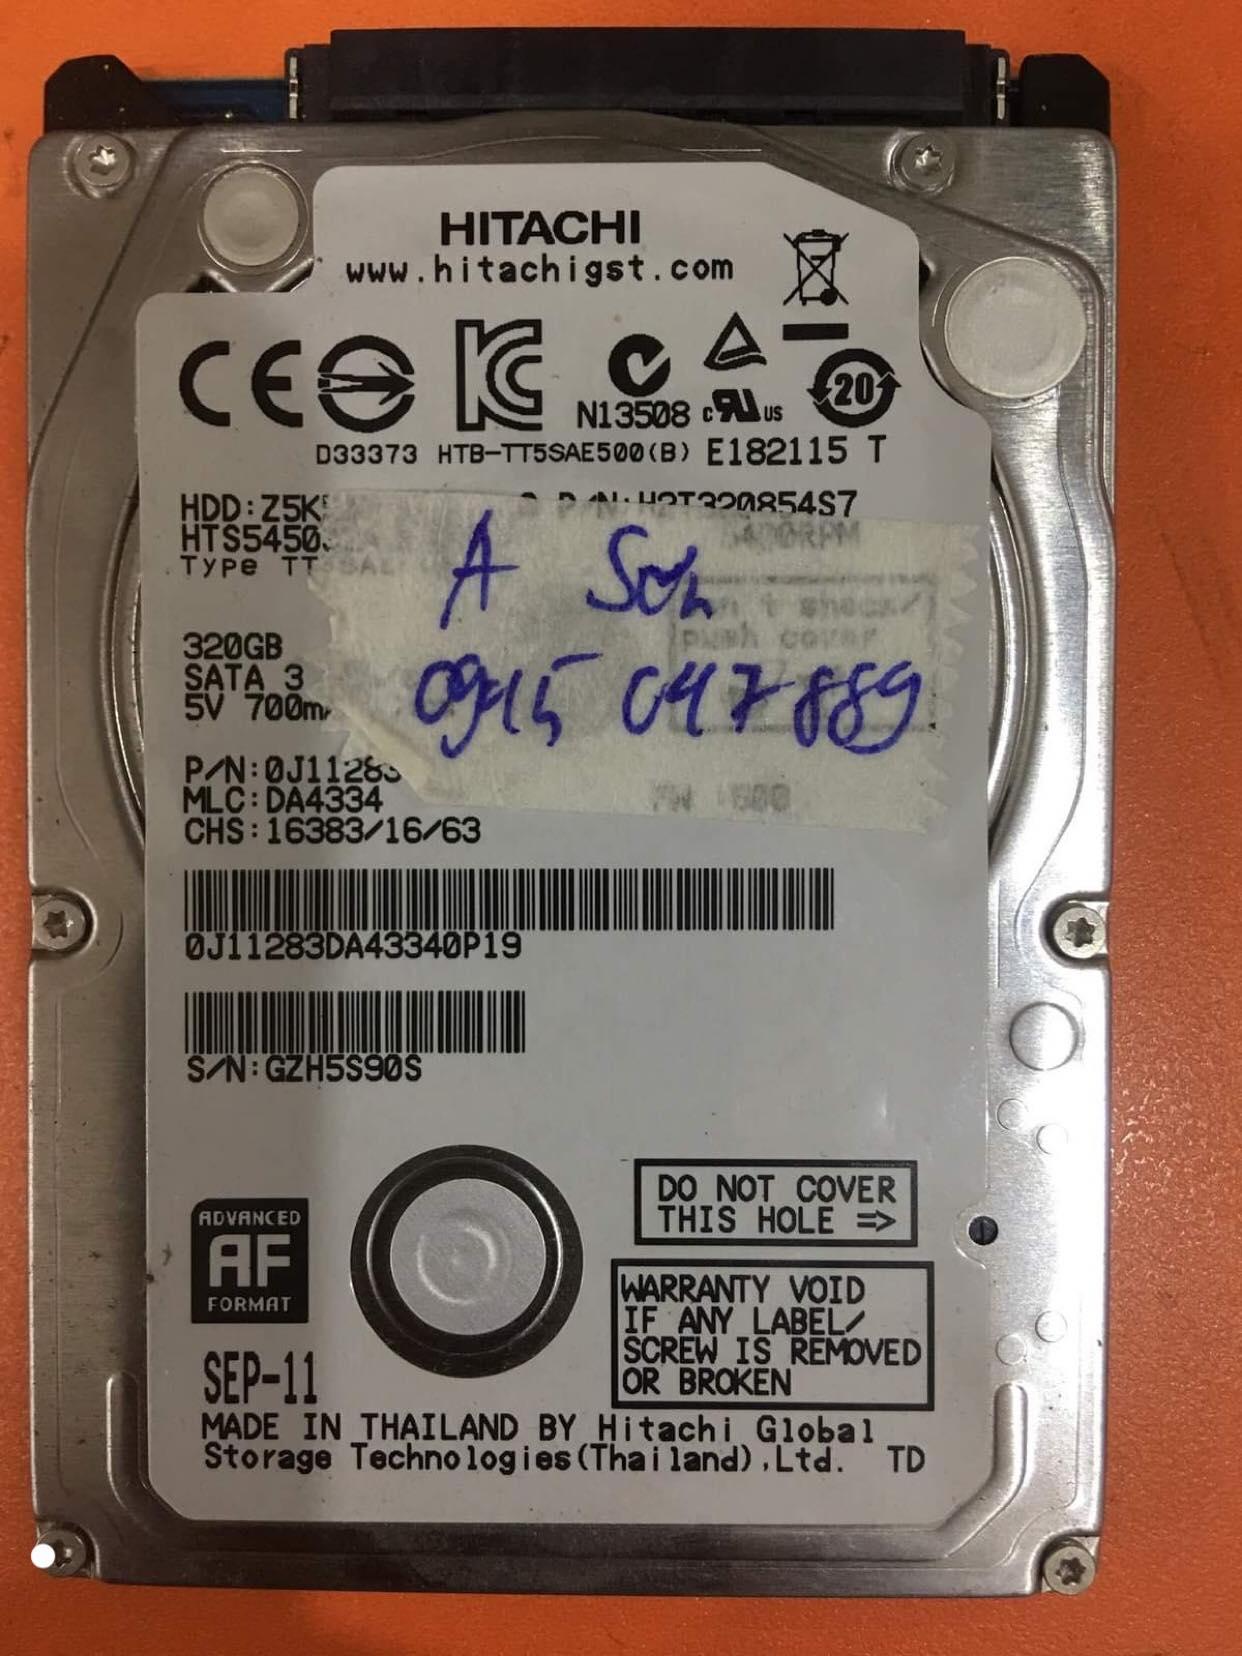 Cứu dữ liệu ổ cứng Hitachi 320GB lỗi cơ 15/02/2020 - cuumaytinh